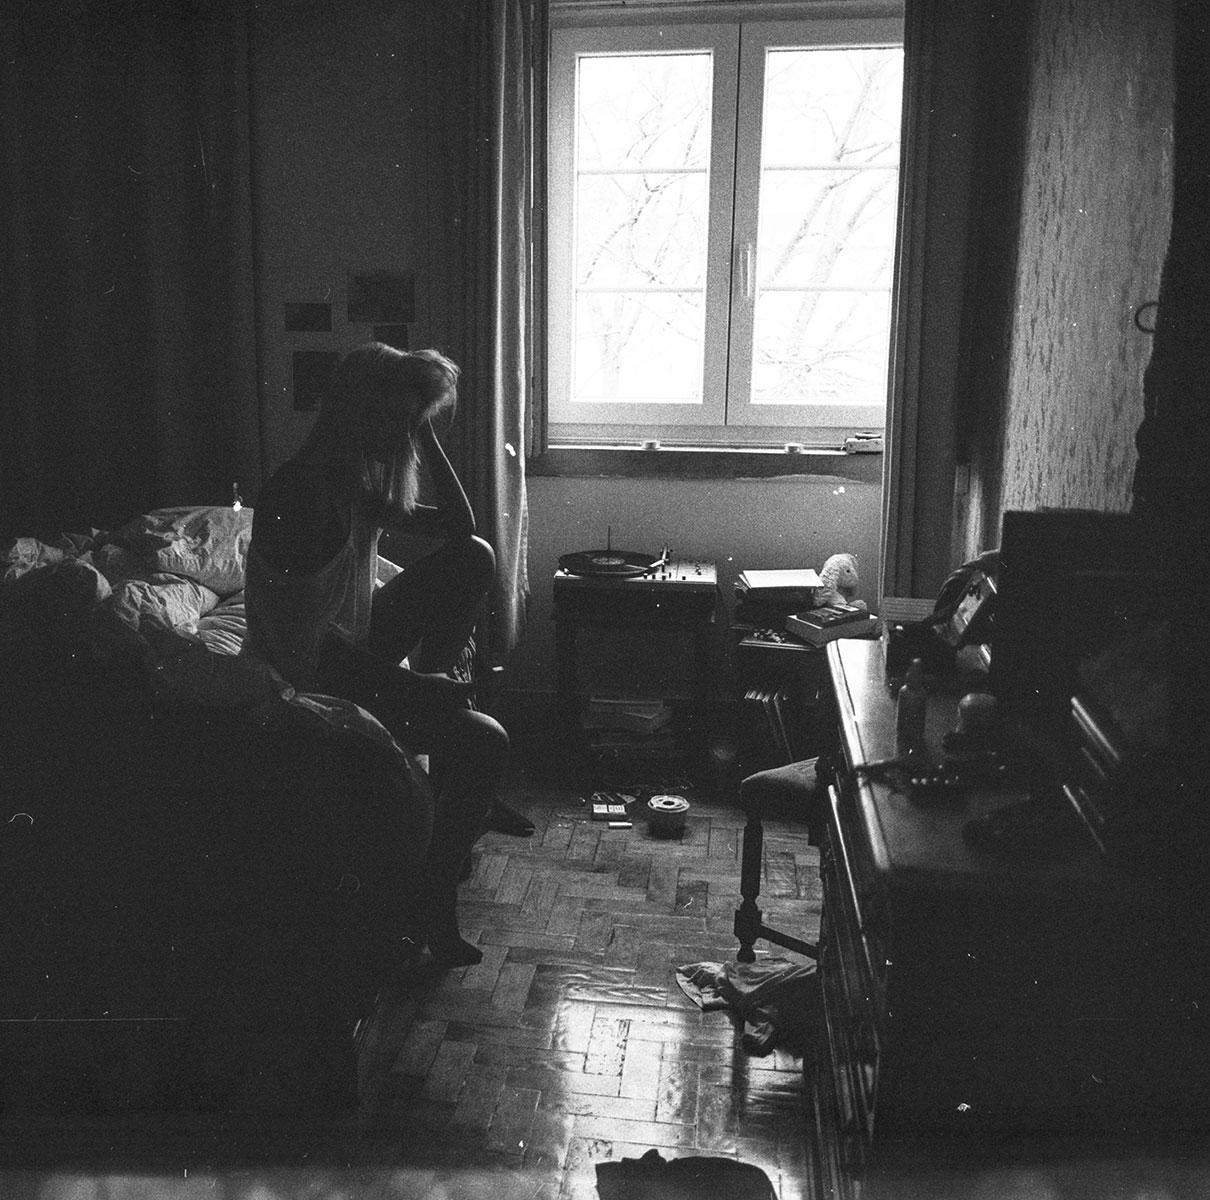 Sean-Riley-The-Slowriders_CAPA-DO-ALBUM---SEAN-RILEY-AND-THE-SLOWRIDERS